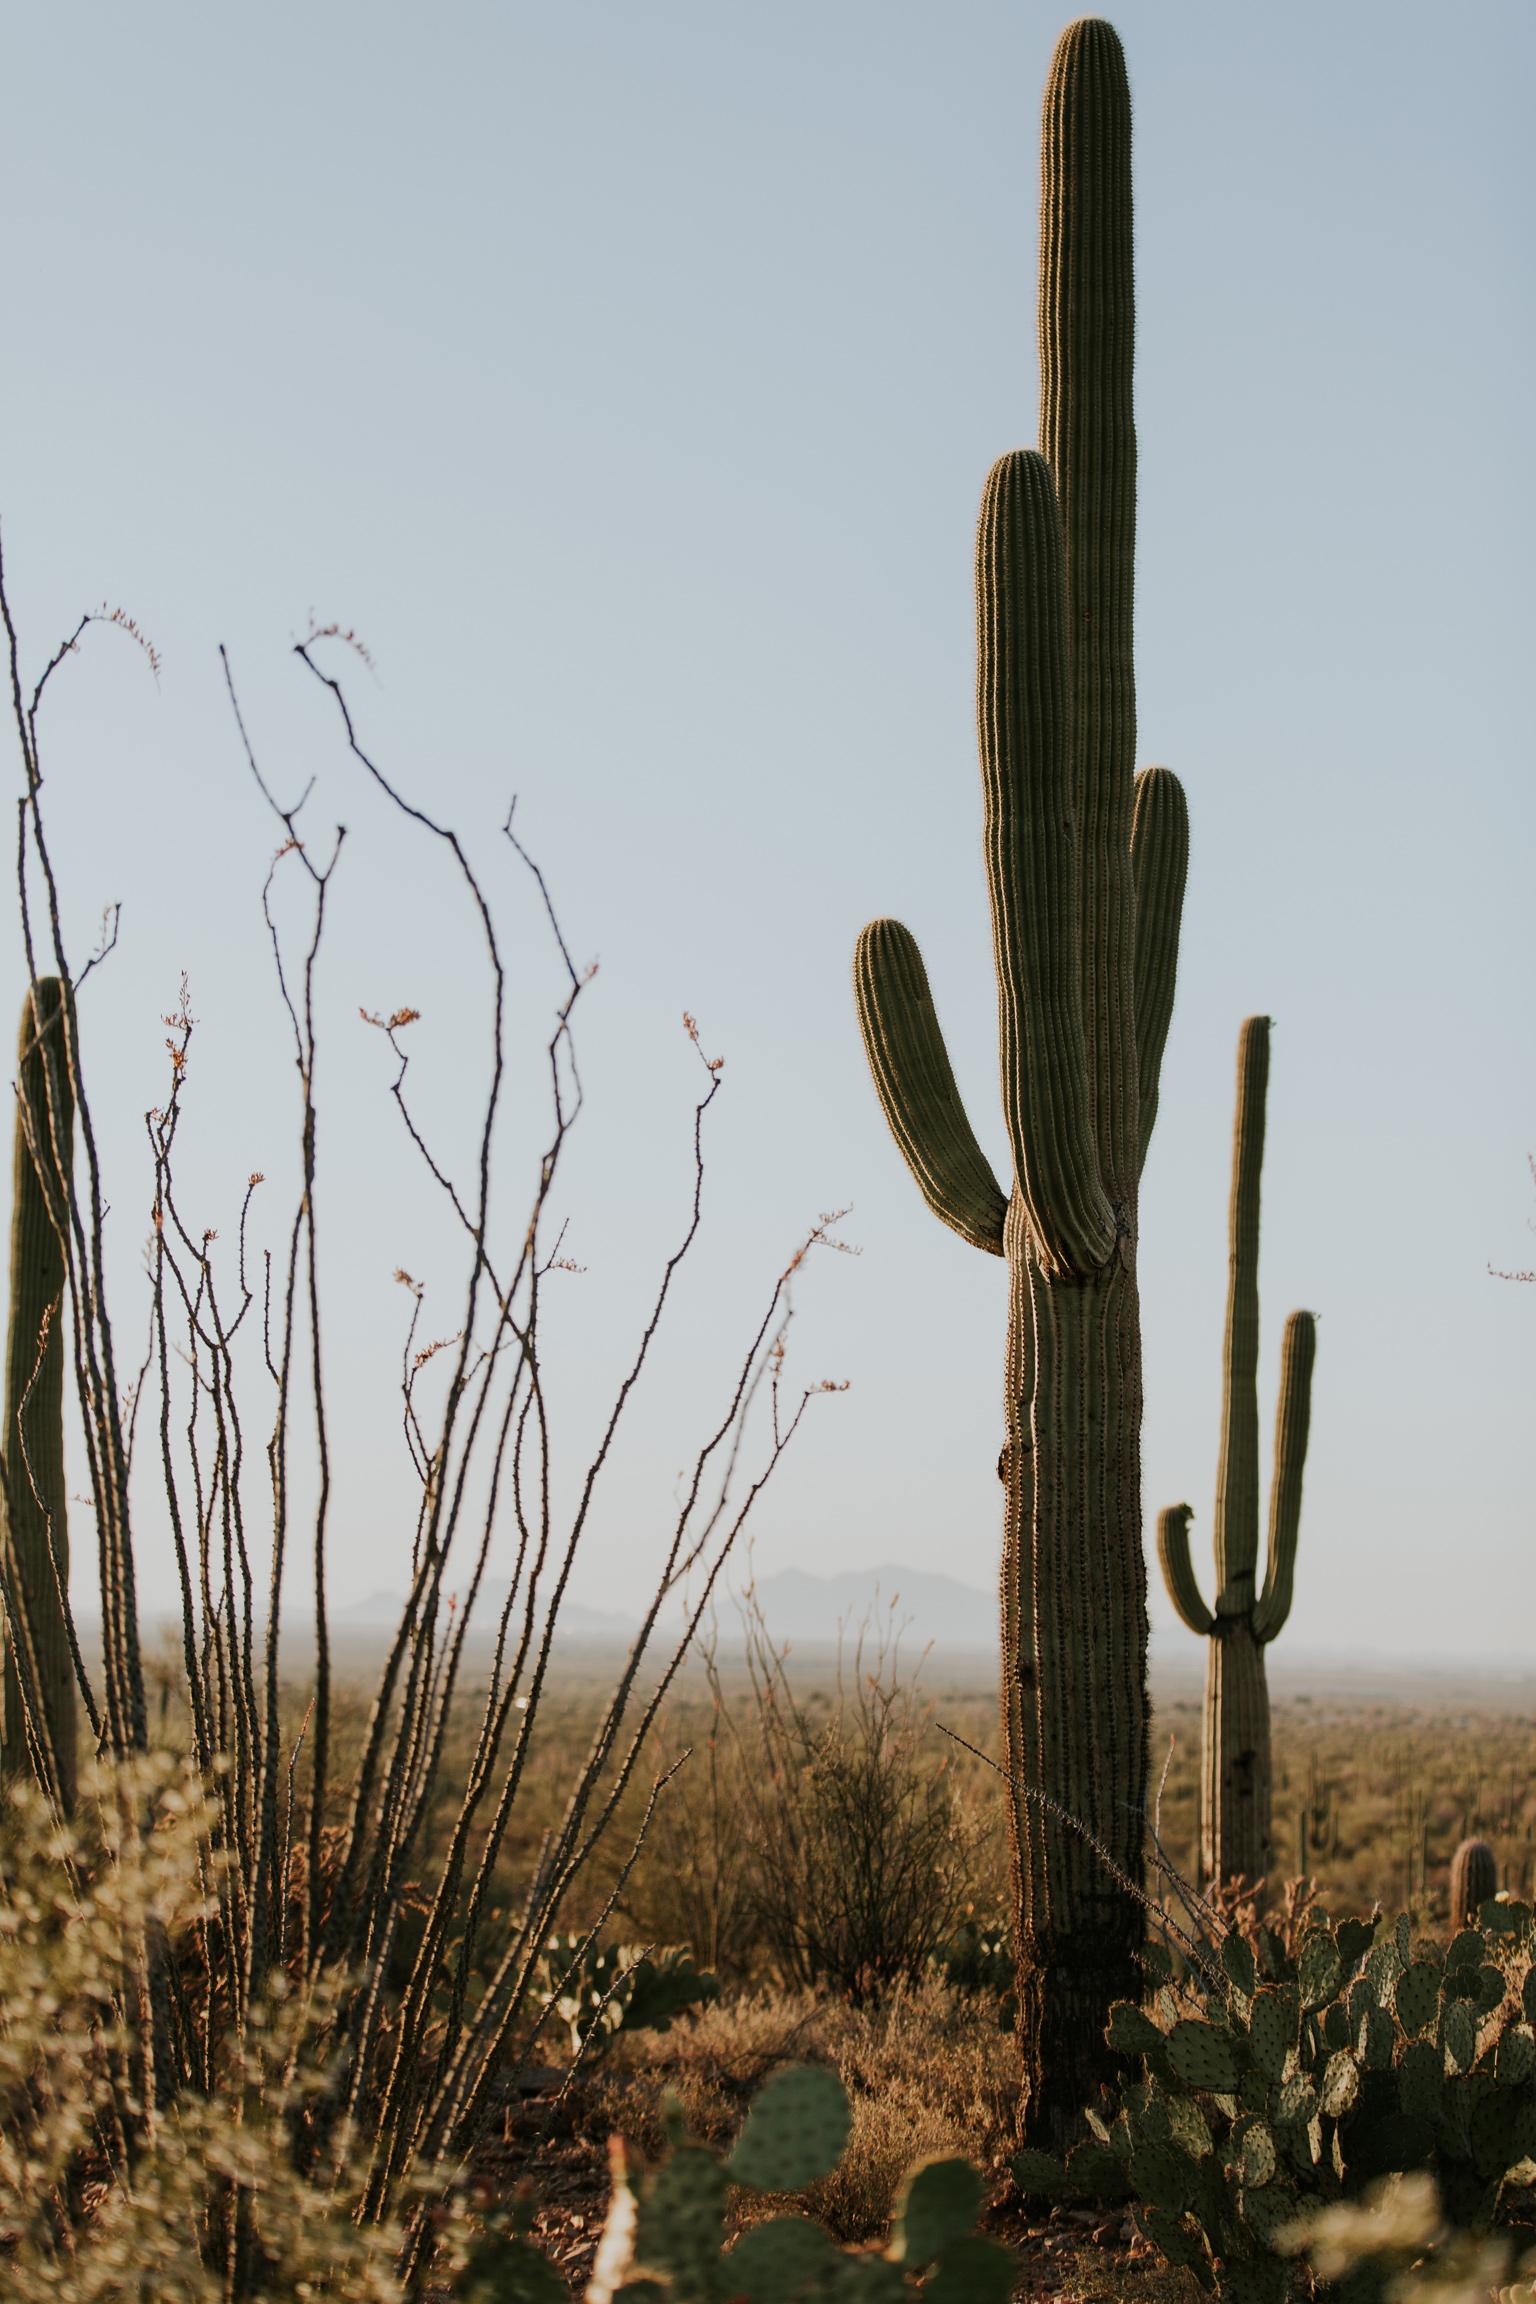 CindyGiovagnoli_Tucson_Arizona_Saguaro_National_Park_cactus_sunset_blooming_spring_sunset_petroglyphs_Native_American_indigenous-002.jpg